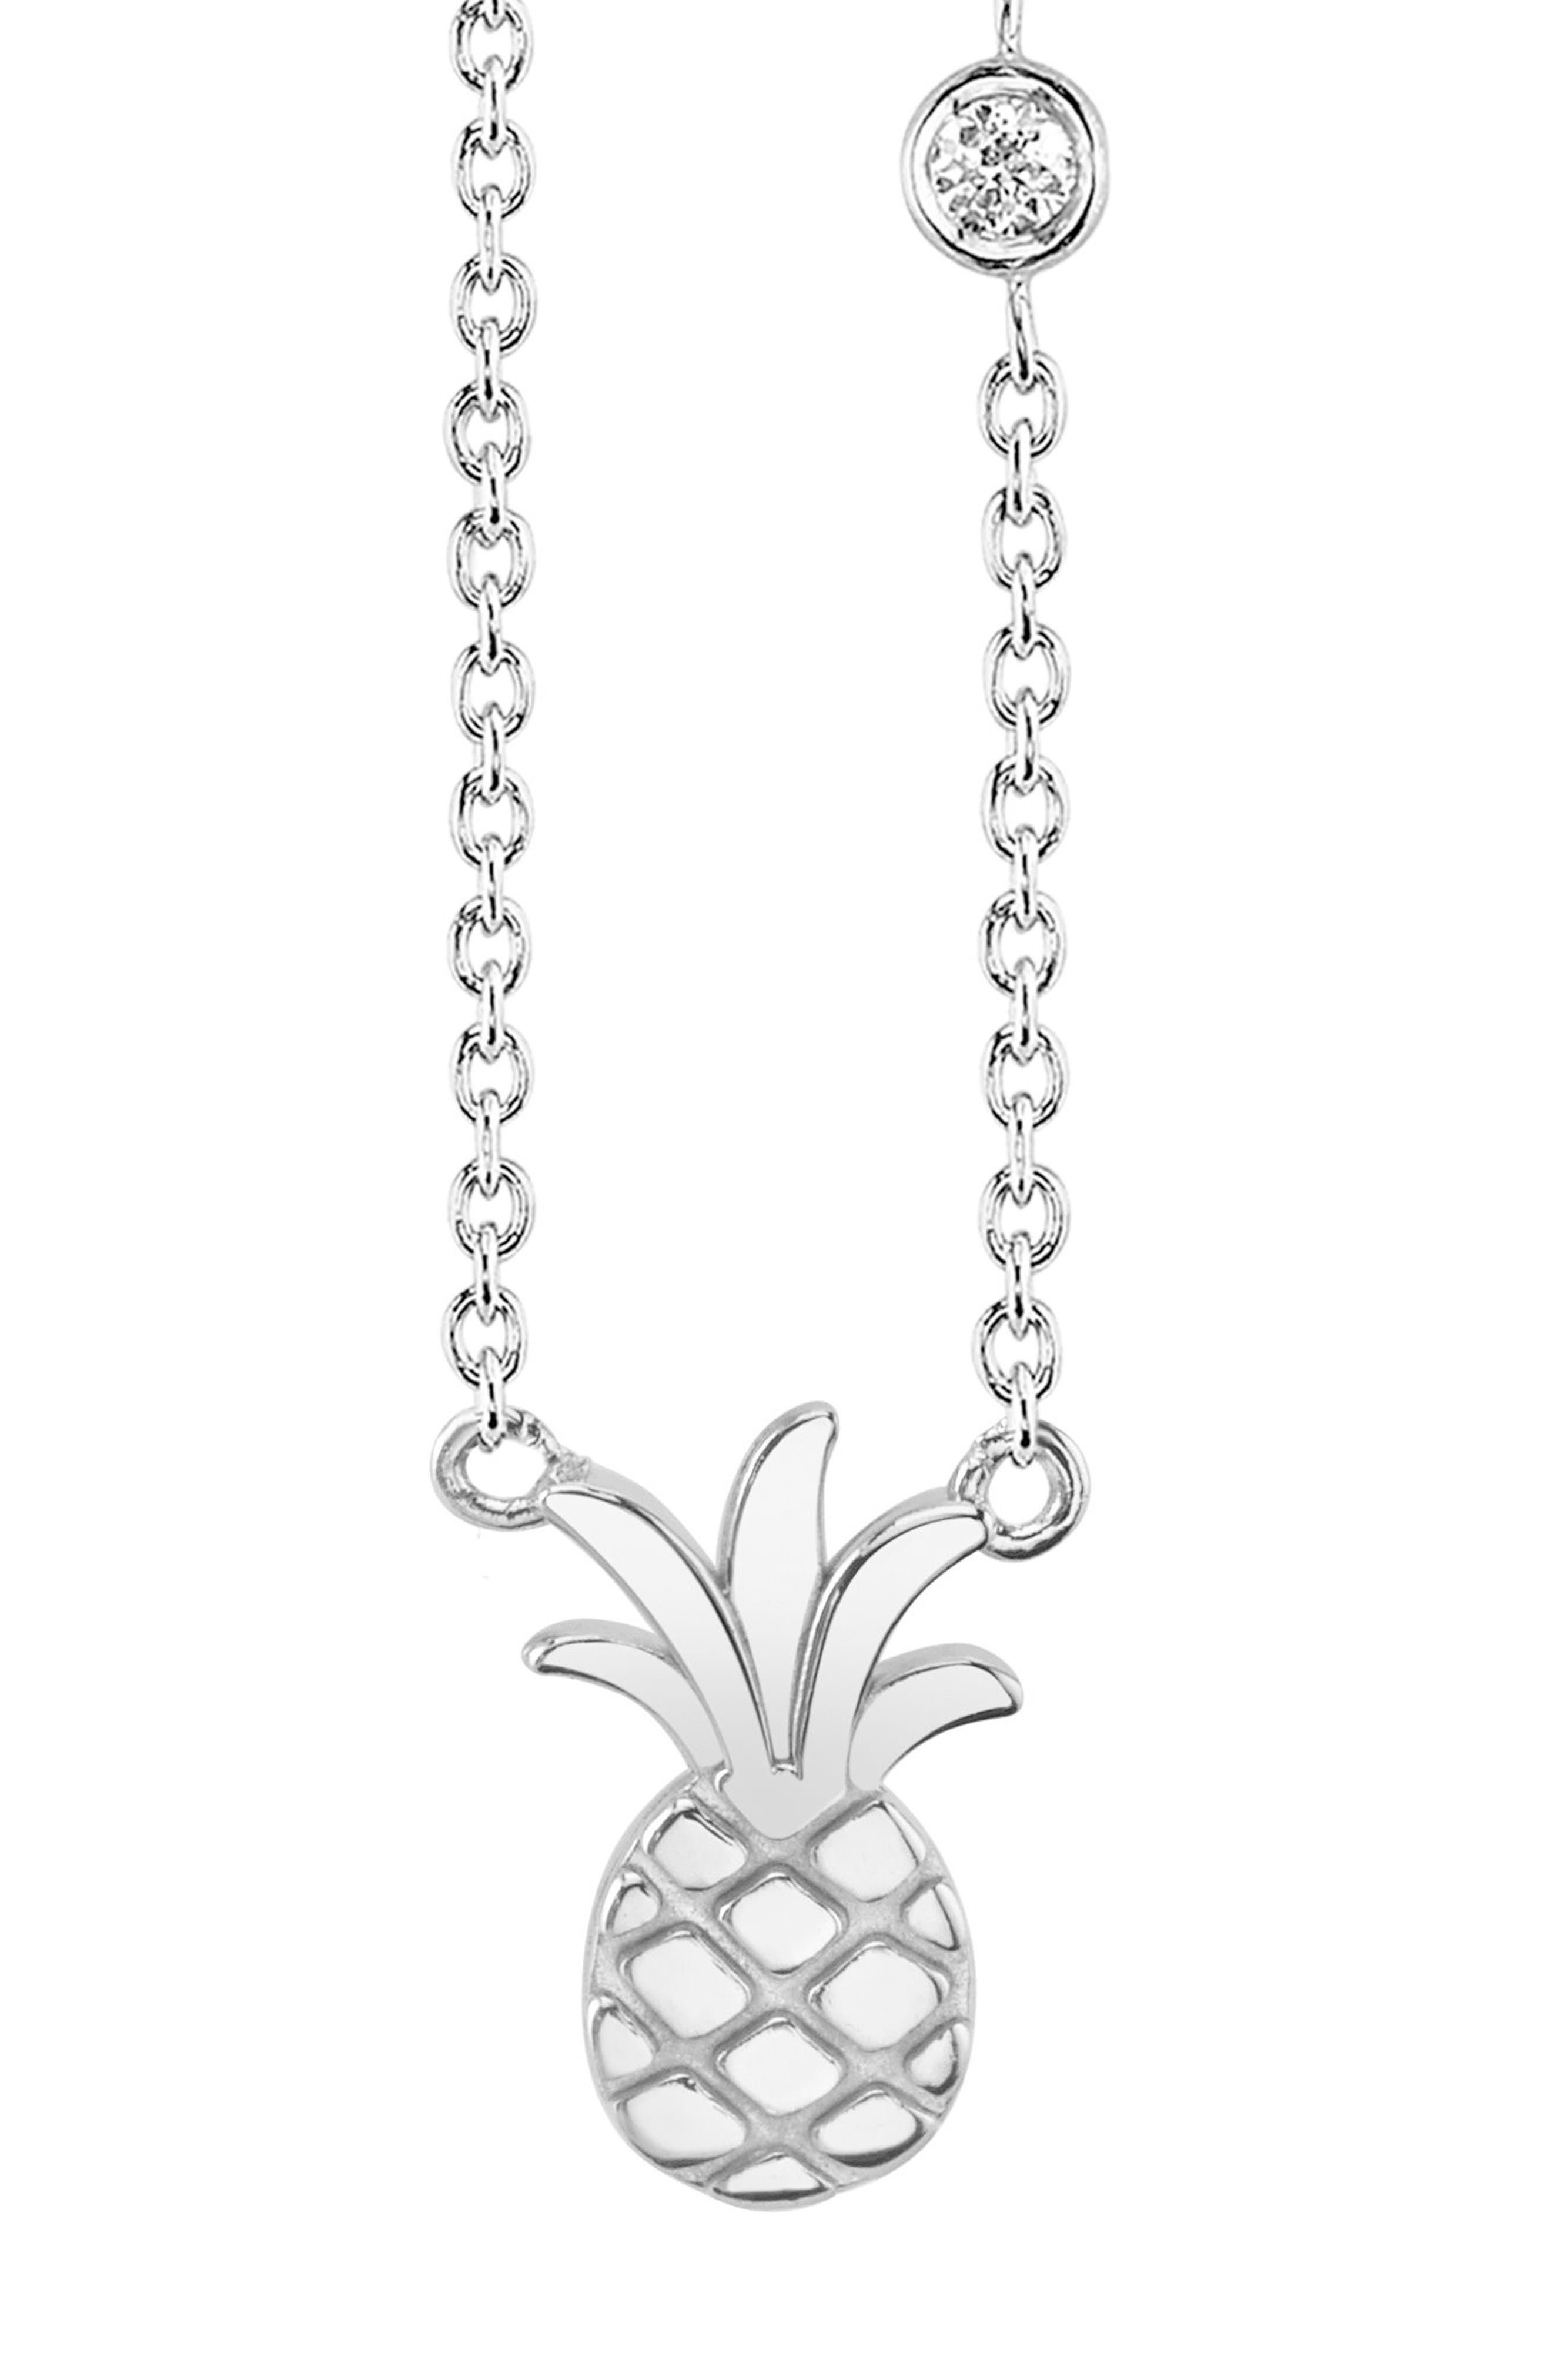 Pineapple Diamond Pendant Necklace,                             Main thumbnail 1, color,                             Silver